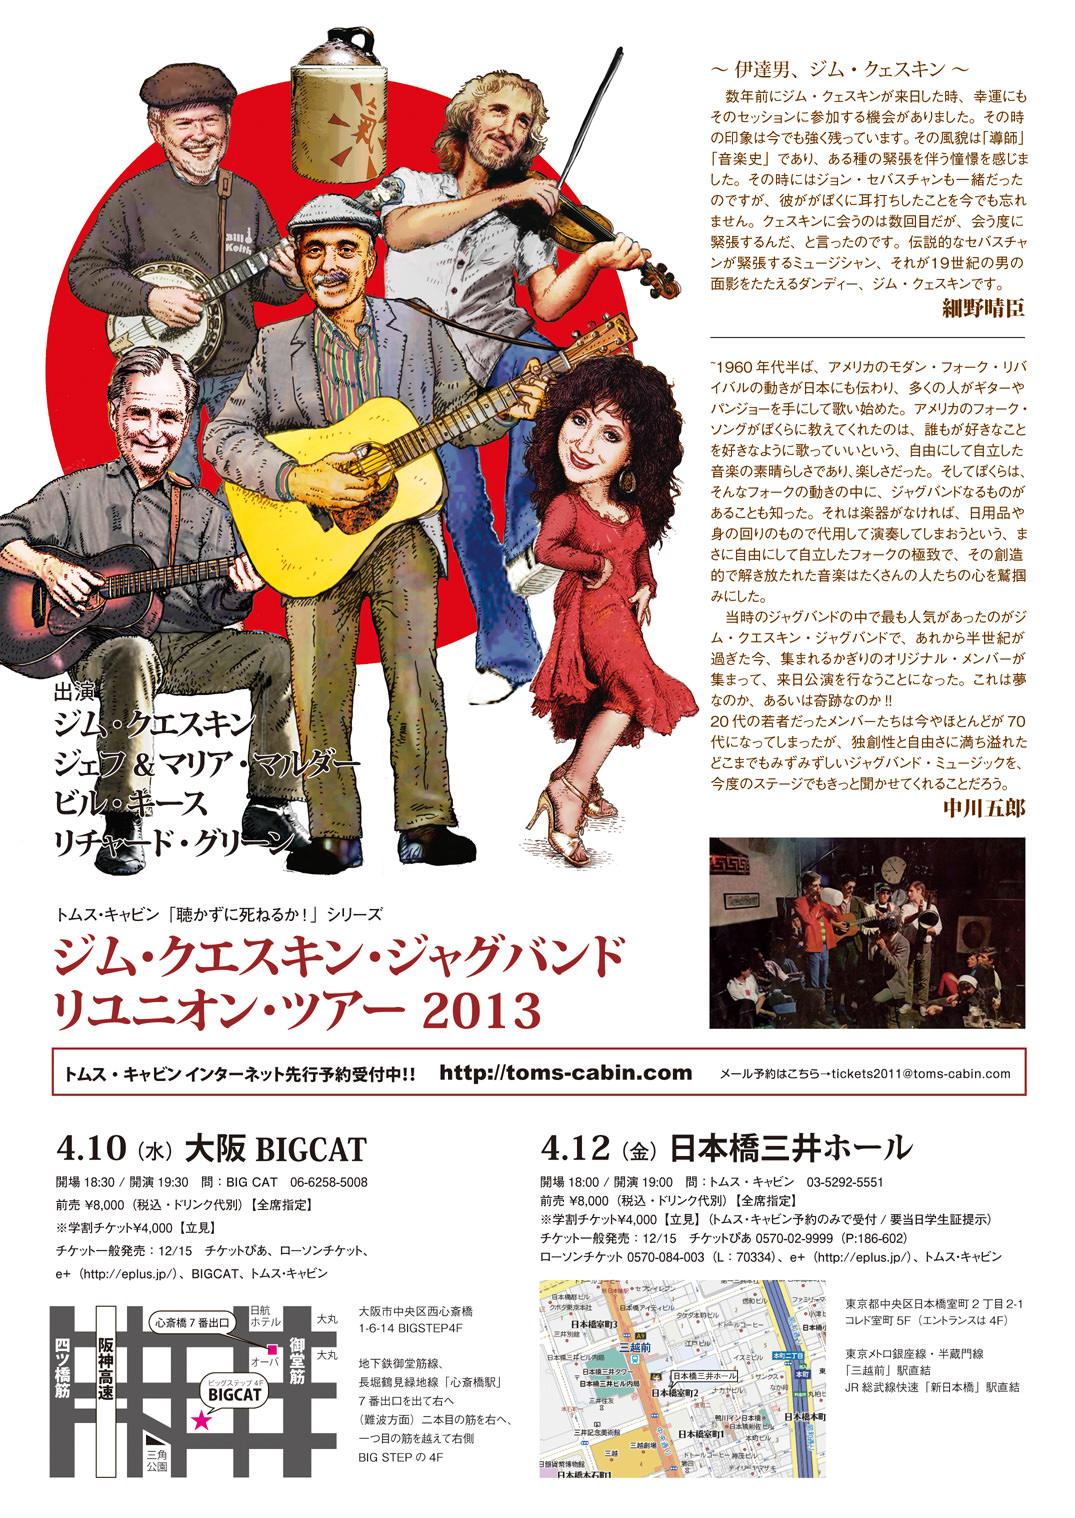 Jim Kweskin & The Jug Band - The Best Of Jim Kweskin & The Jug Band